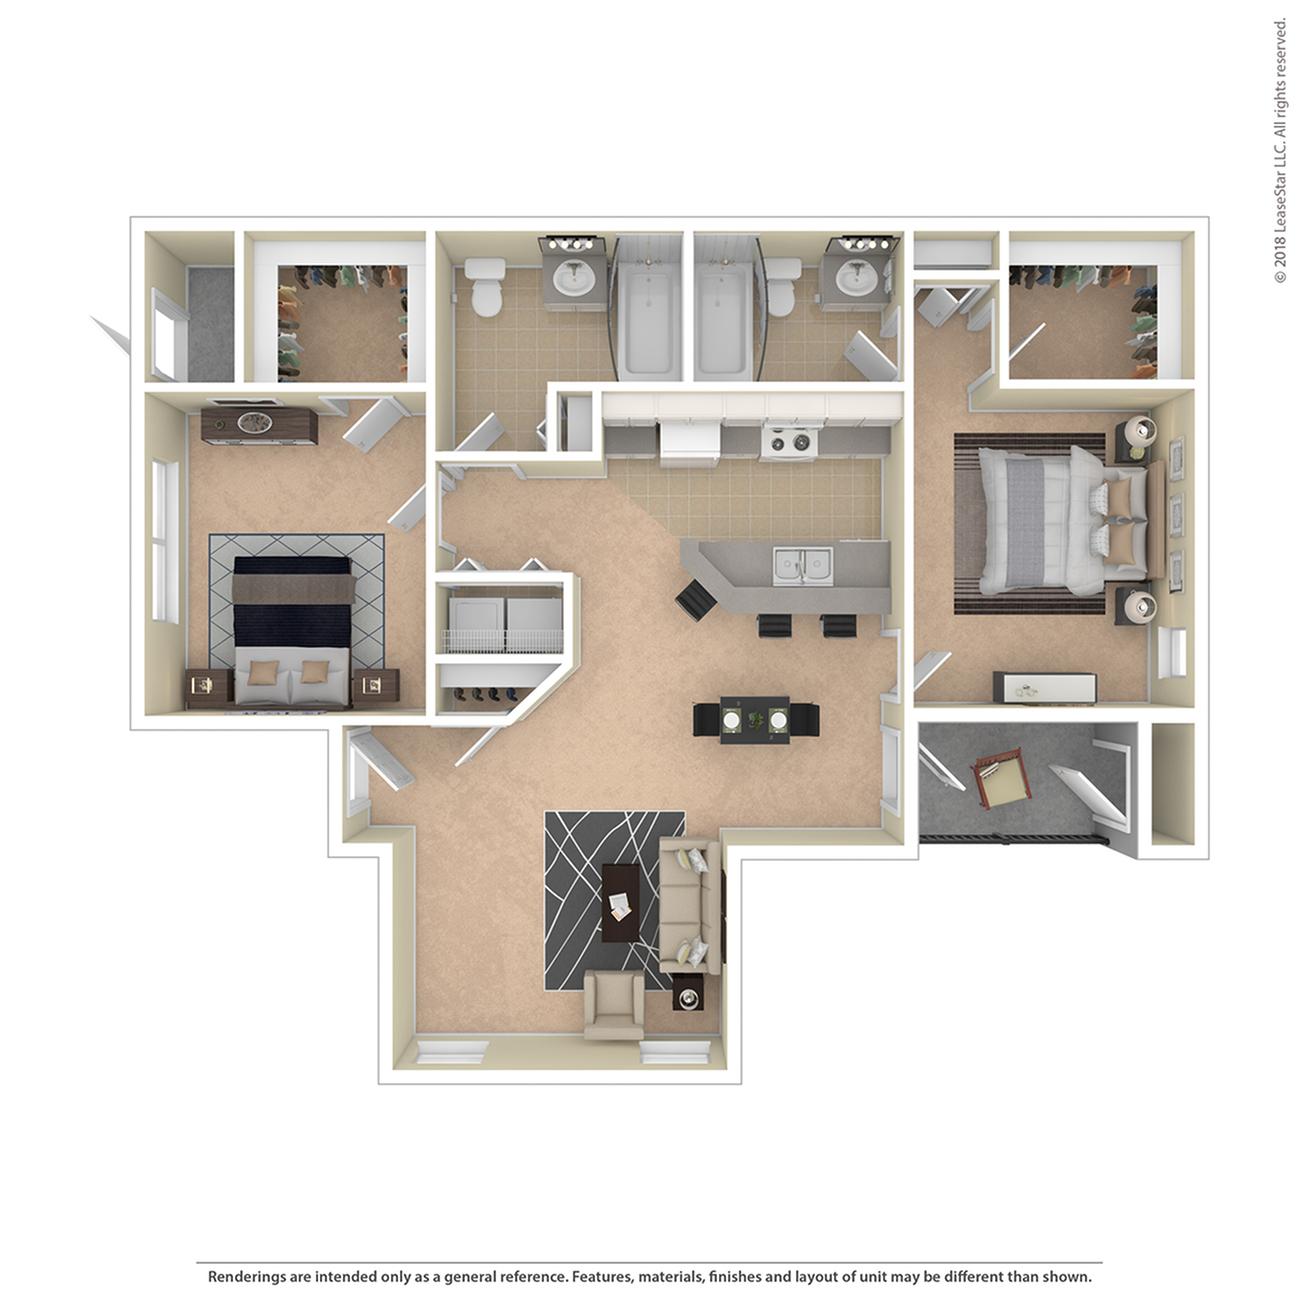 2 Bdrm Floor Plan | Pet Friendly Apartments In Colorado Springs | Willows at Printers Park